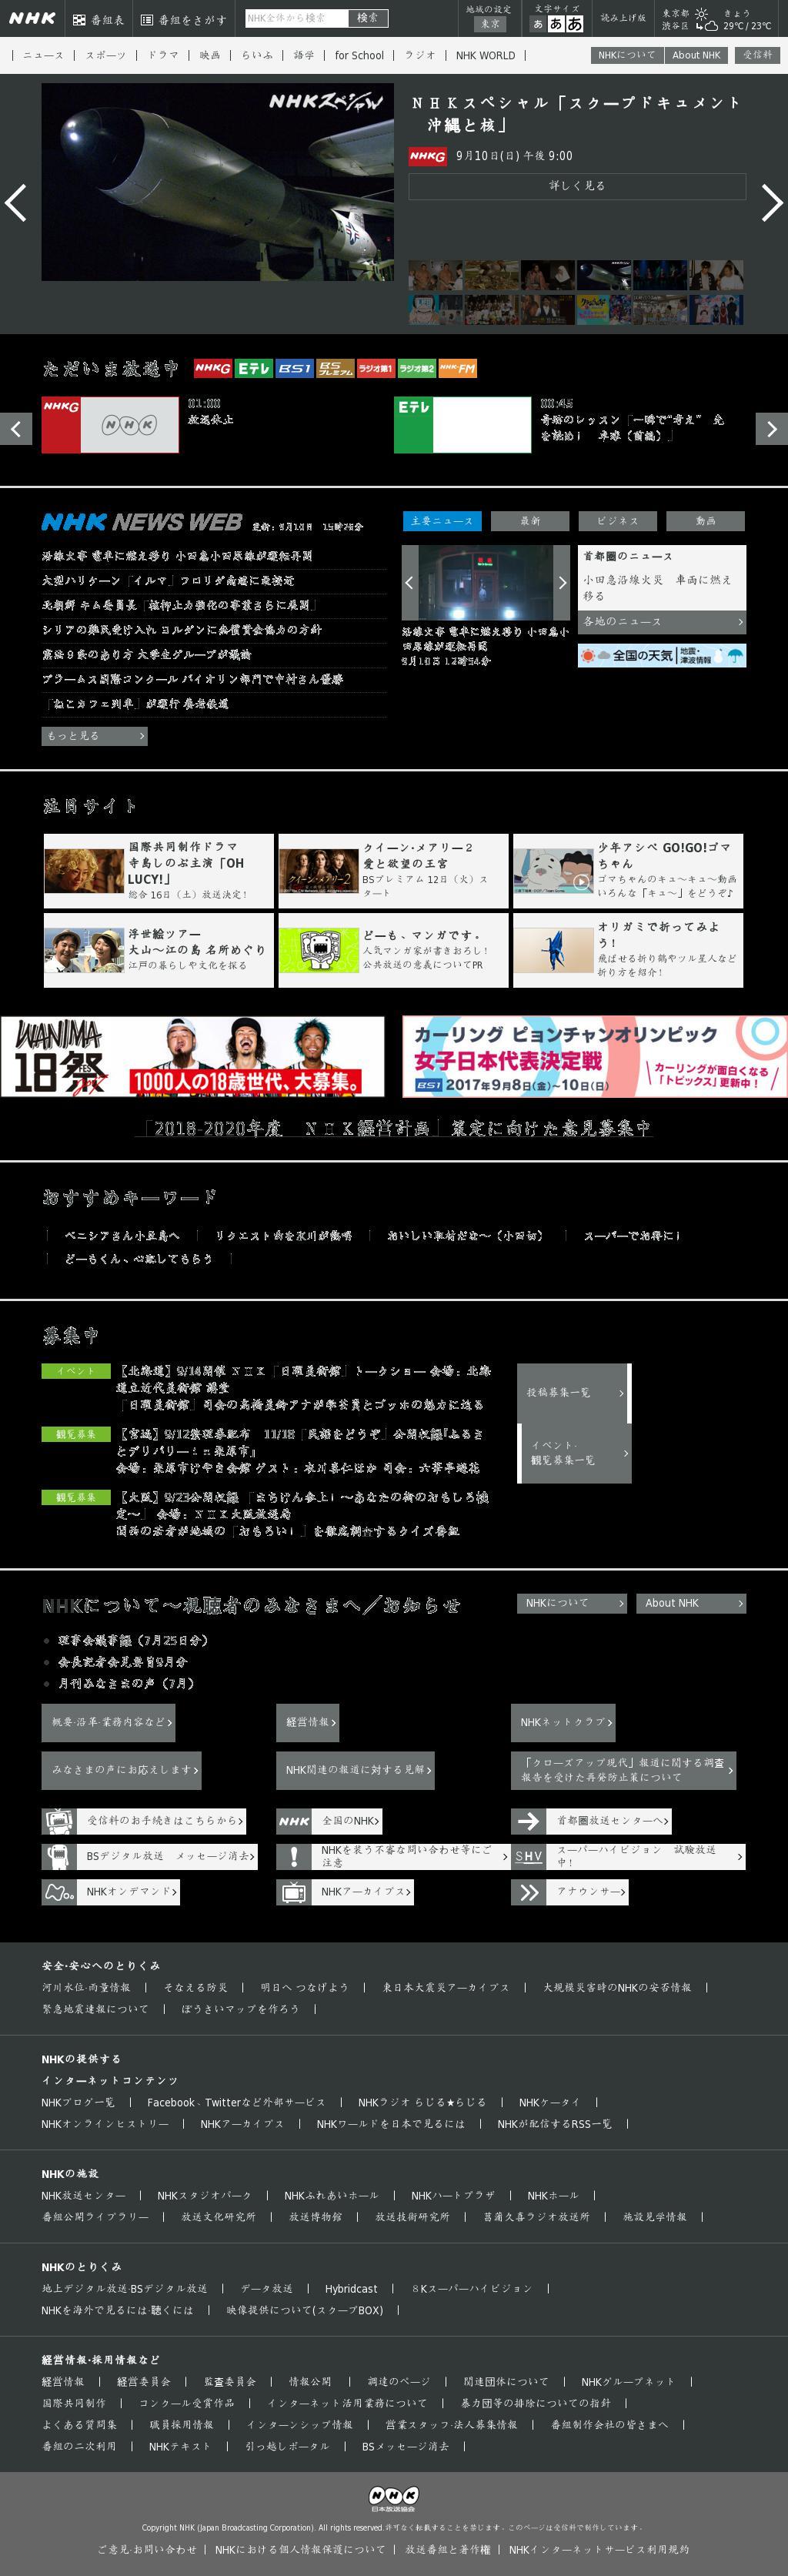 NHK Online at Sunday Sept. 10, 2017, 4:13 p.m. UTC